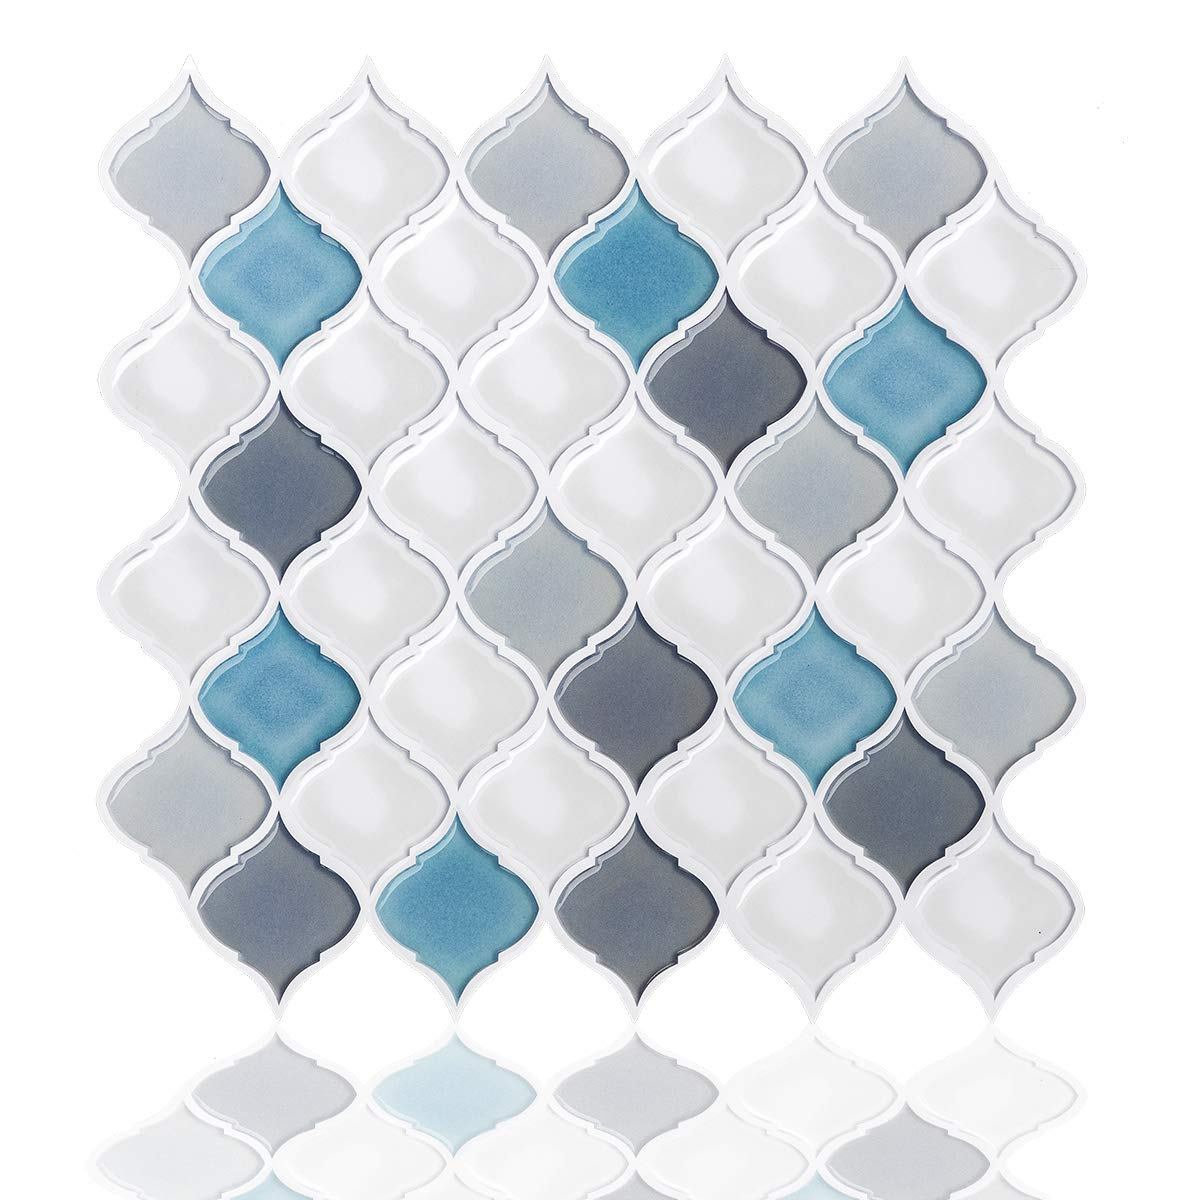 Peel and Stick Wall Tile for Kitchen Backsplash-Slant Blue&White Arabesque Tile Backsplash-Kitchen Backsplash Tiles Peel and Stick Wall Stickers,6 Sheets